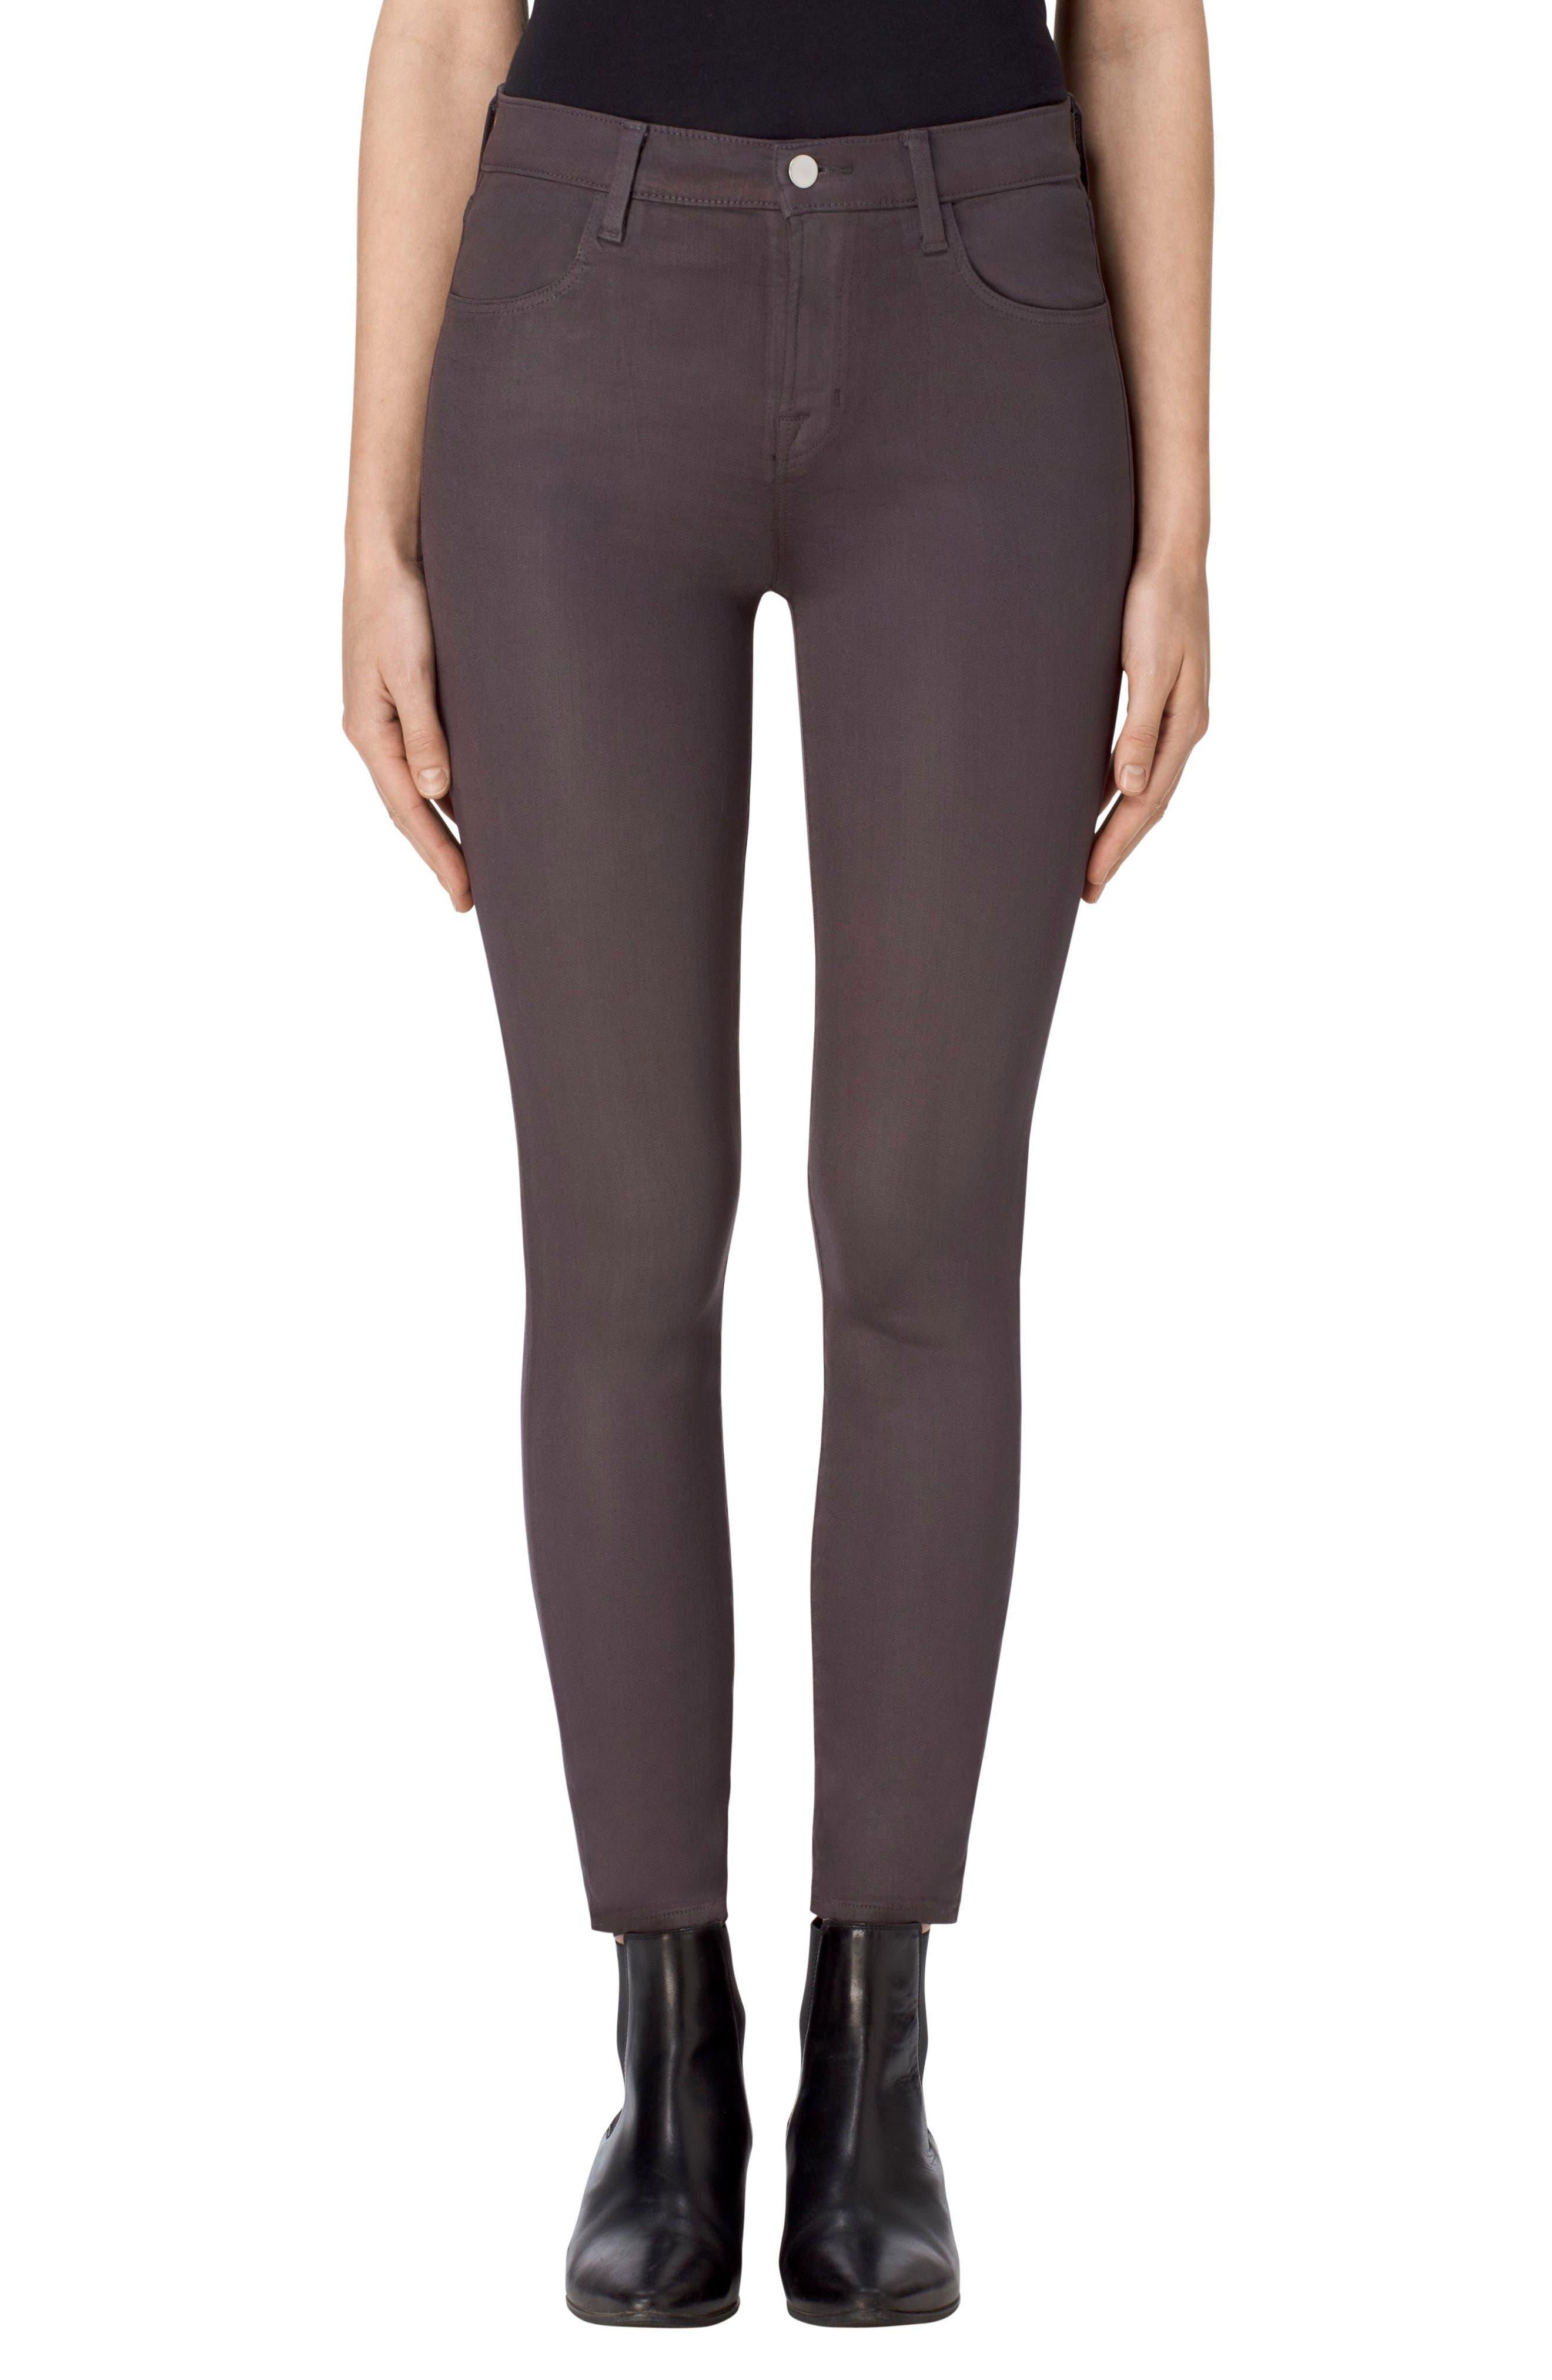 Image of J Brand Alana High Waist Crop Skinny Jeans